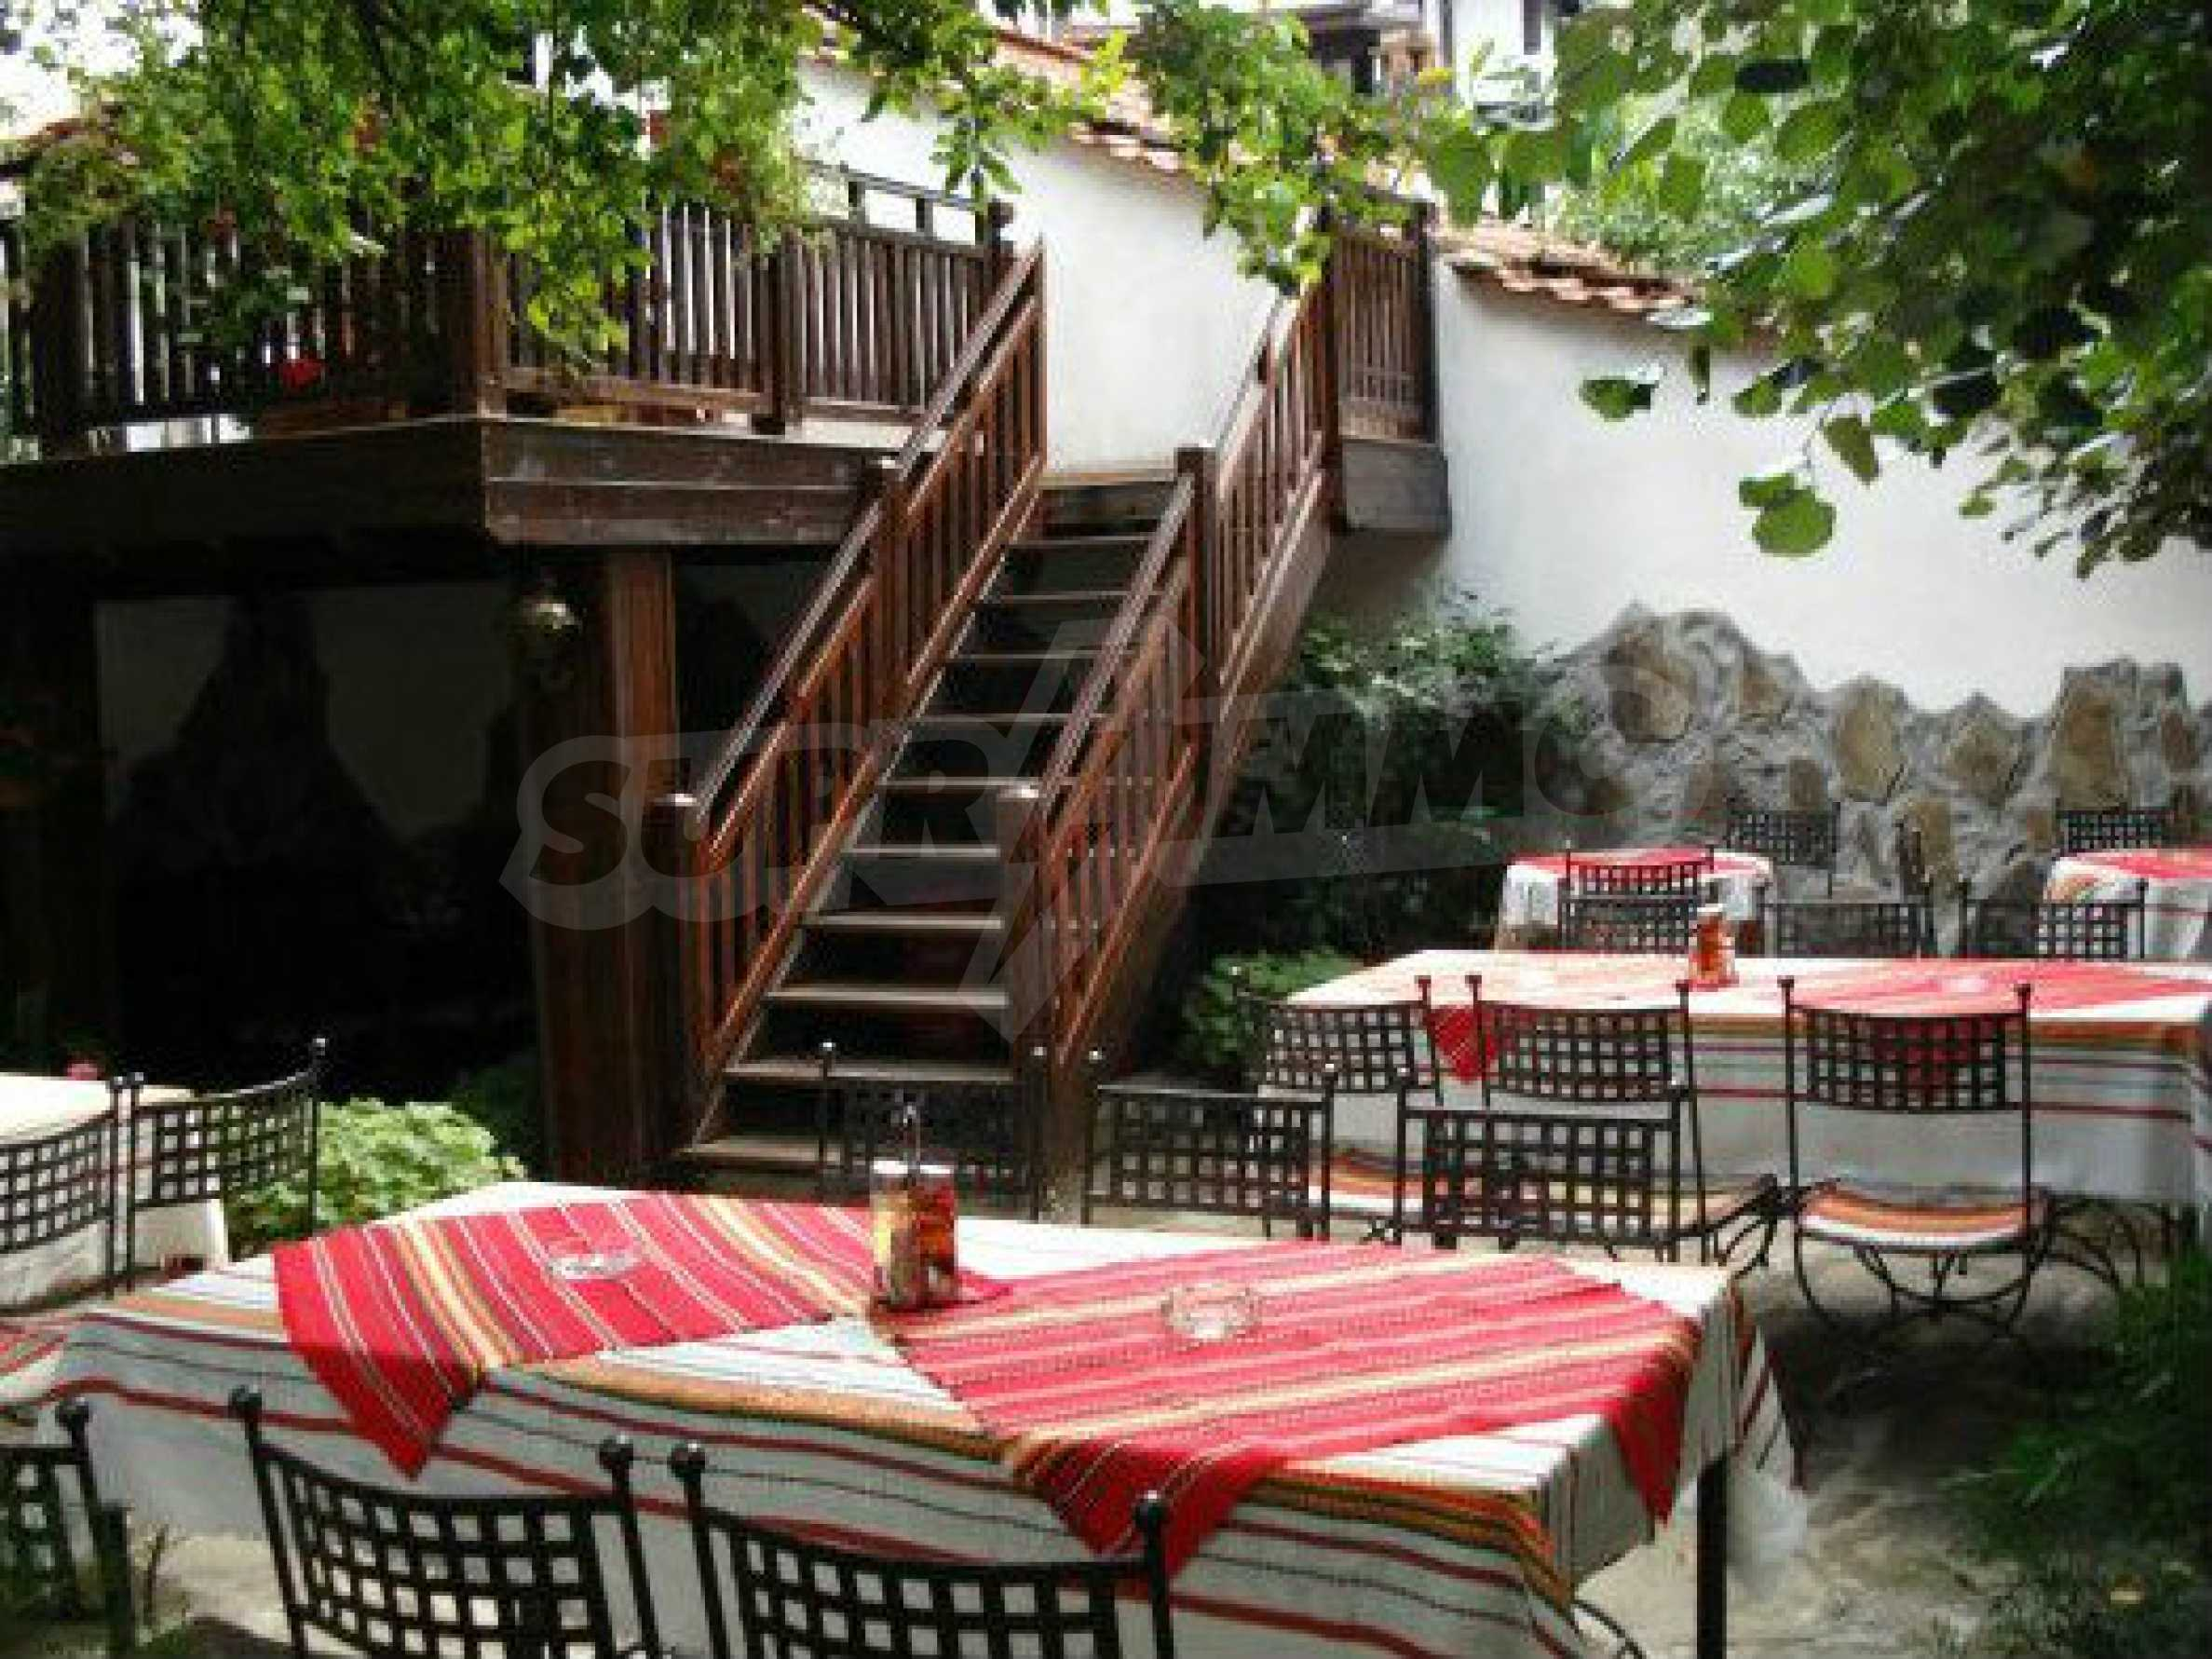 Hotelanlage mit Restaurant am Ufer des Flusses Osam in Lovech 61